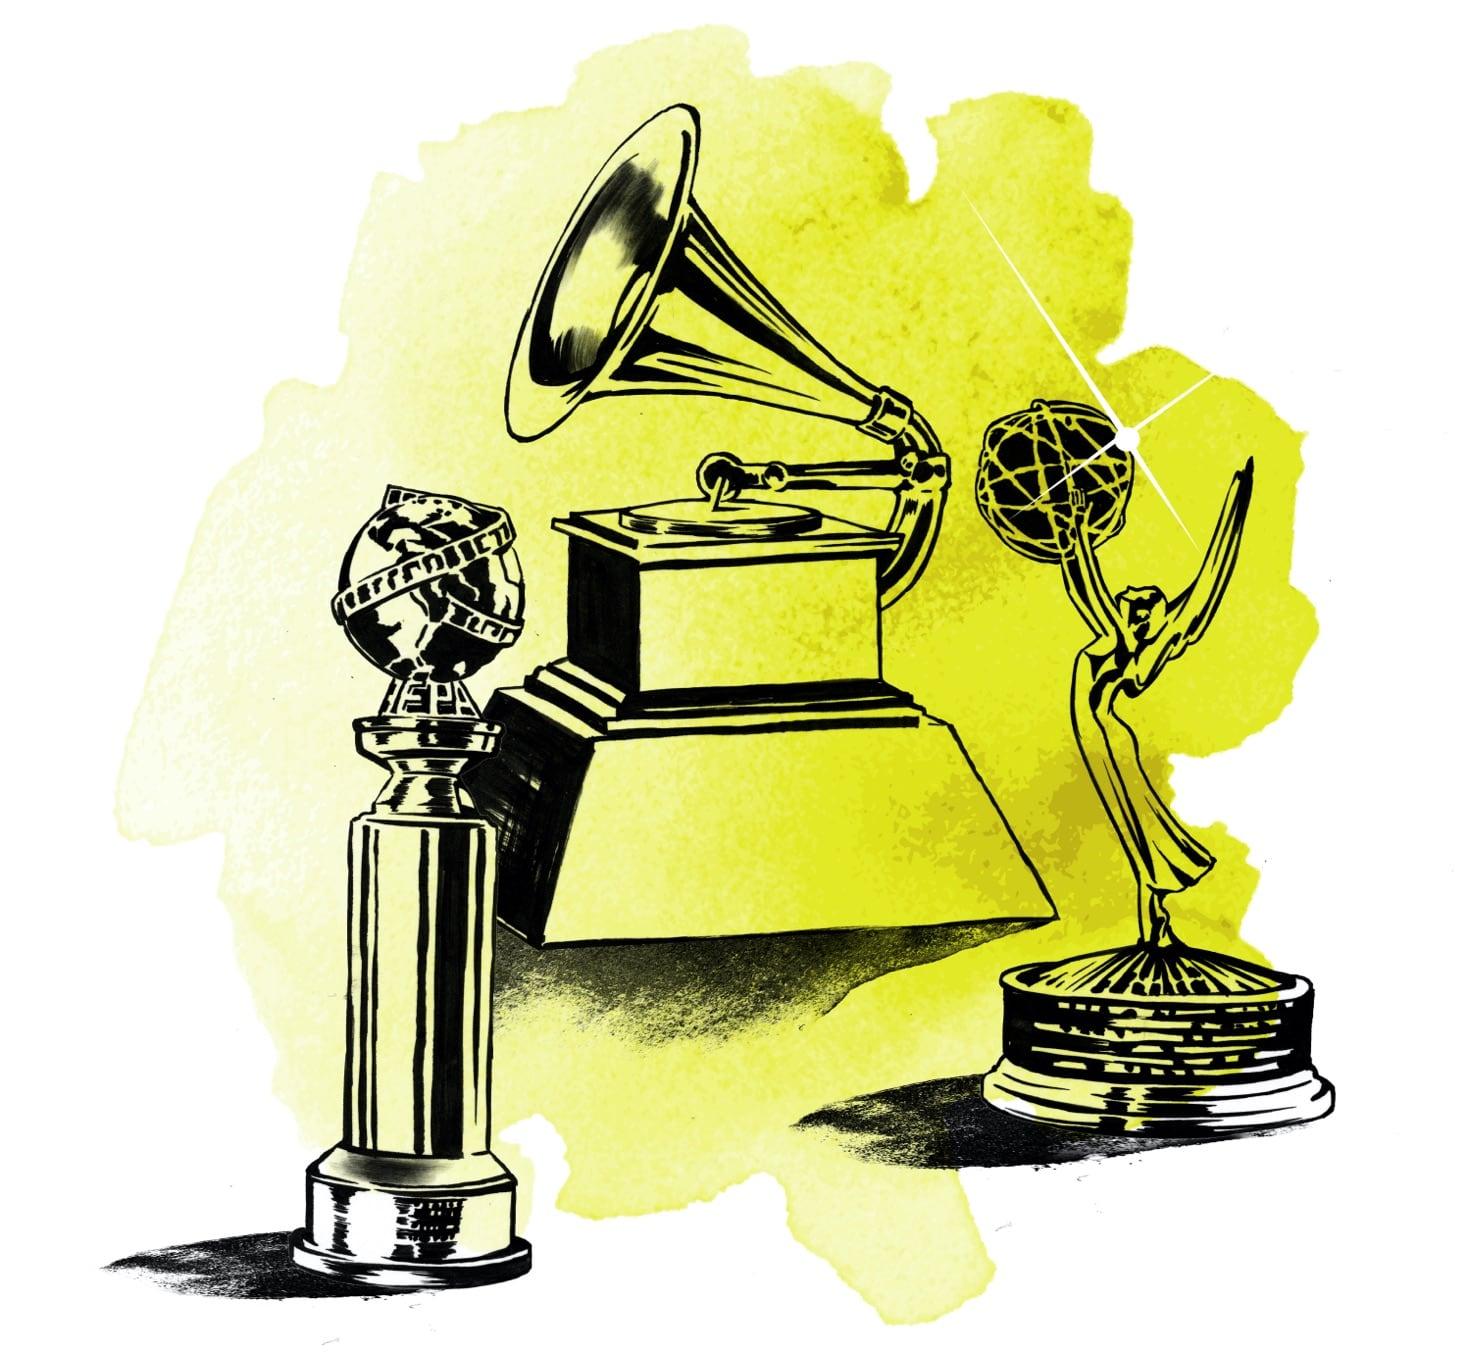 A watercolor illustration of a Golden Globe, a Grammy, and an Emmy statue — all awards that Diane Warren has won. Not quite an Egot, she's an Egg!